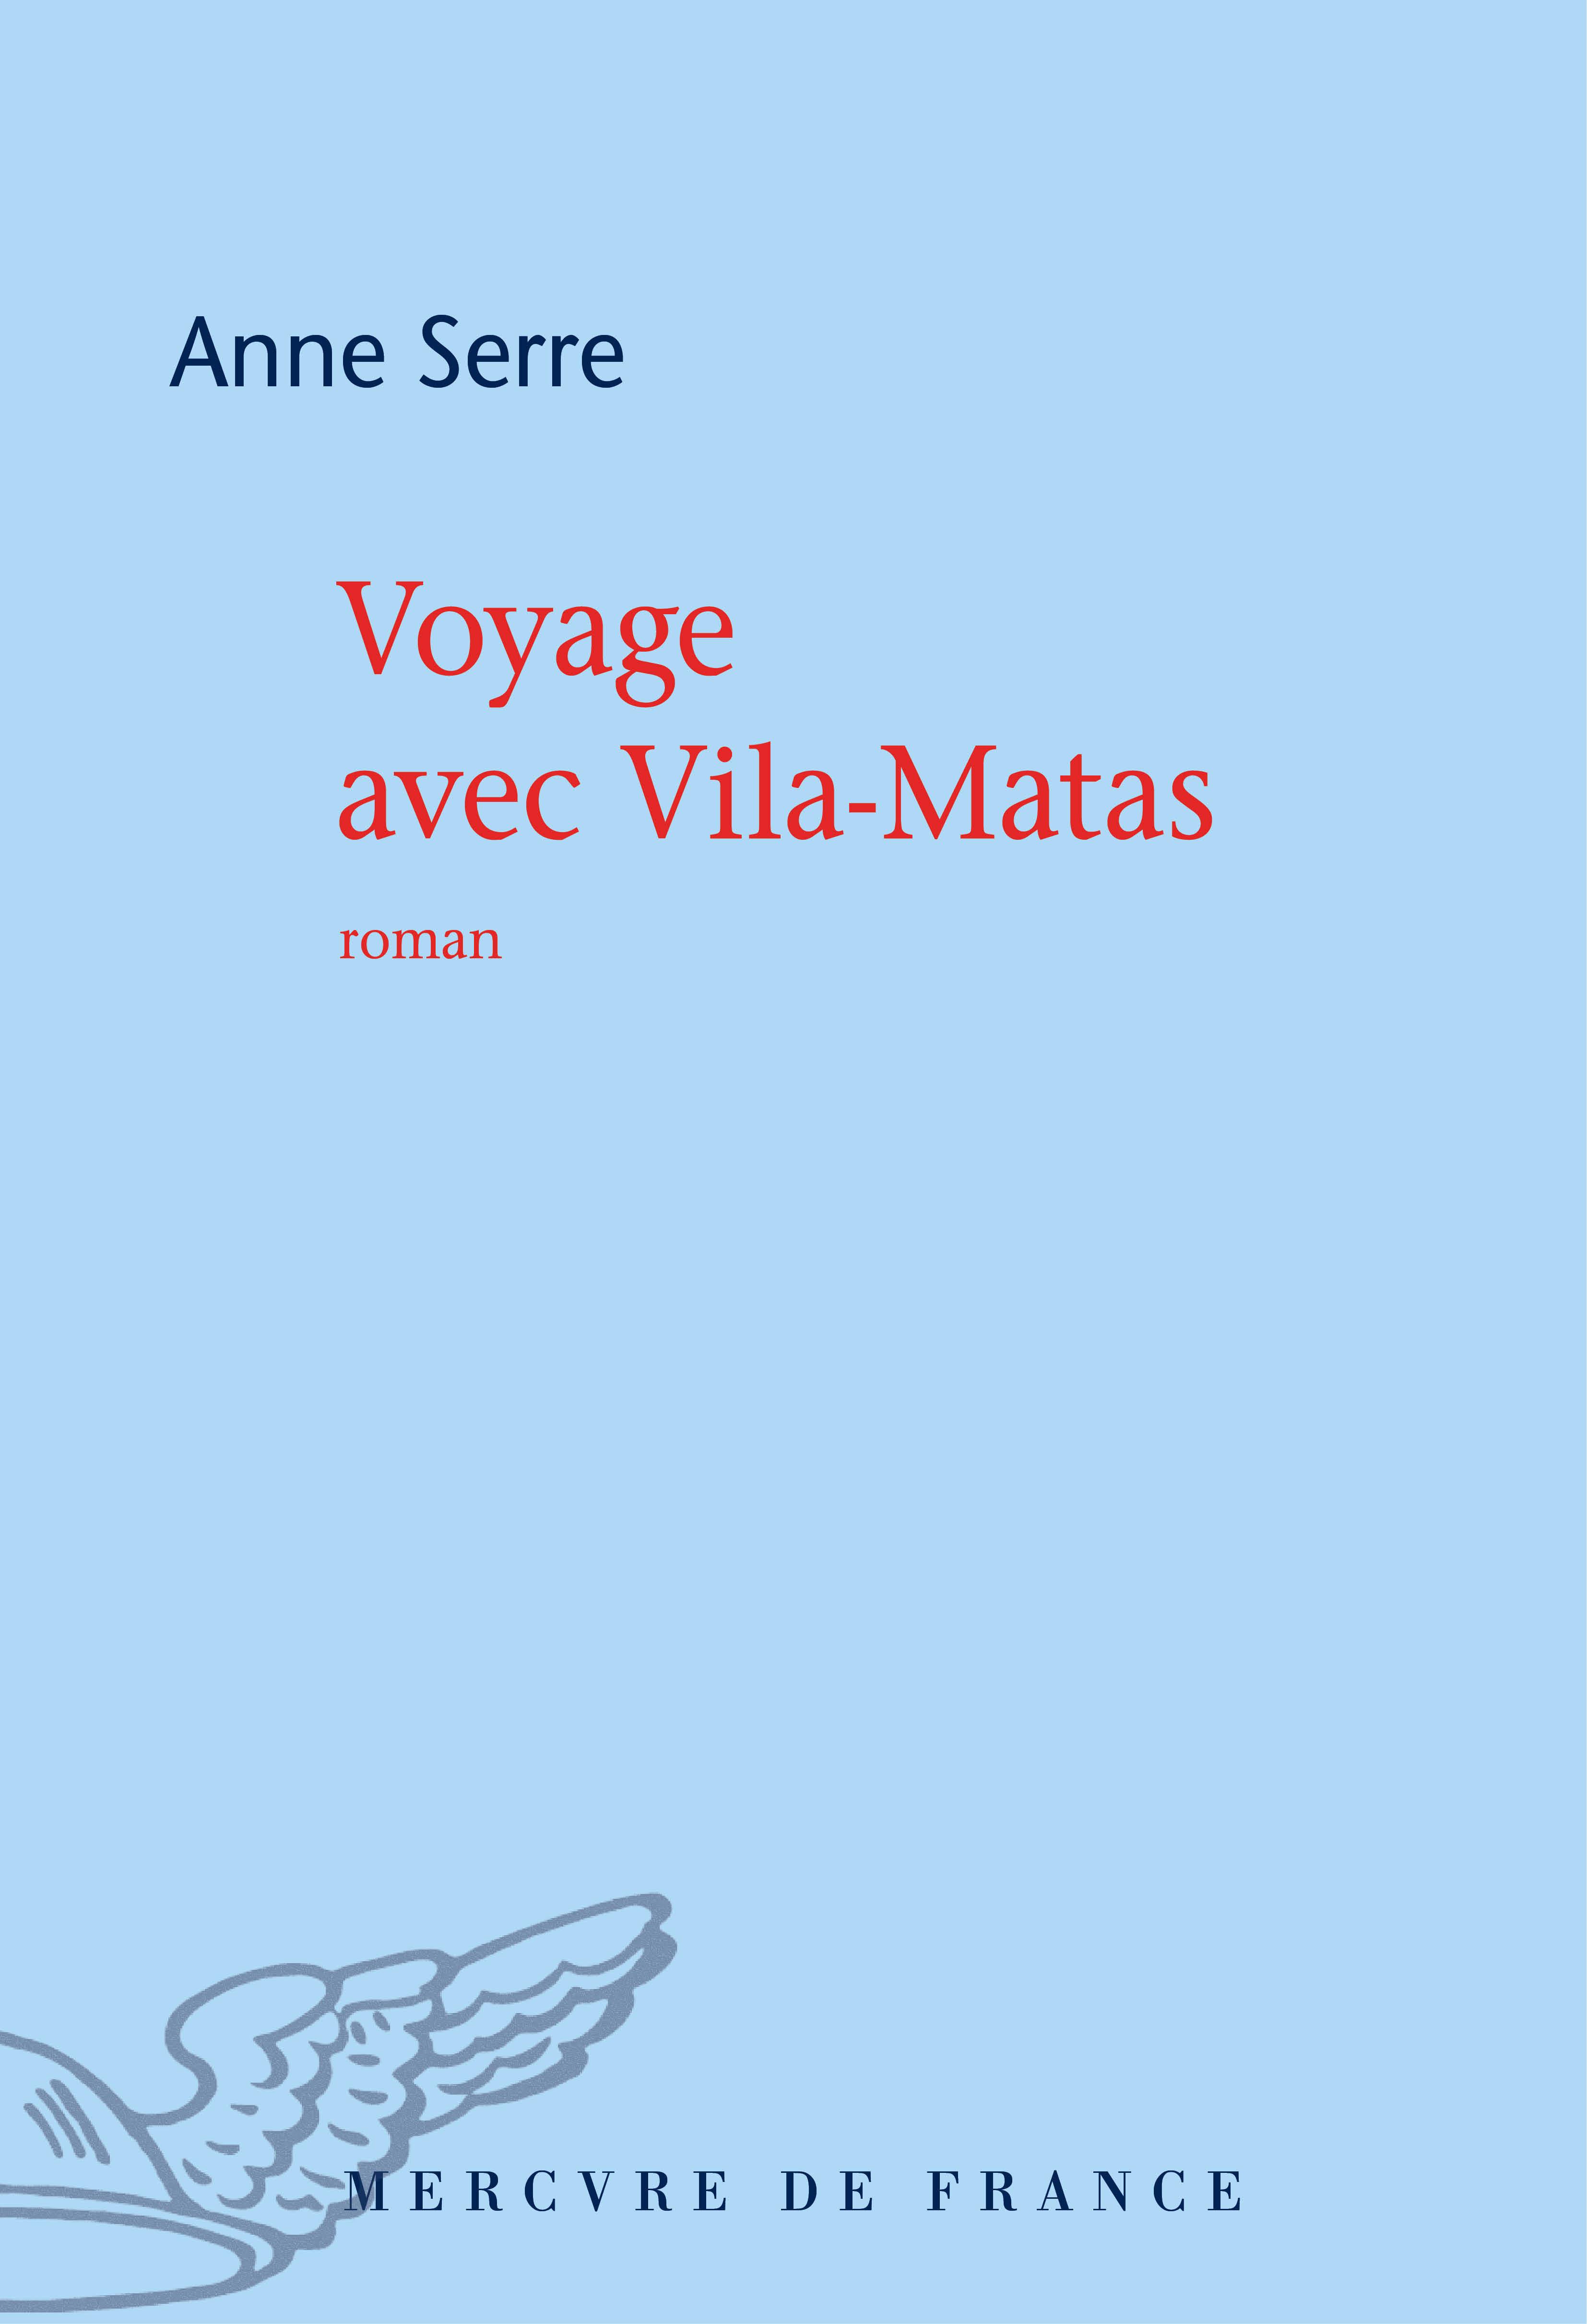 Voyage avec Vila-Matas